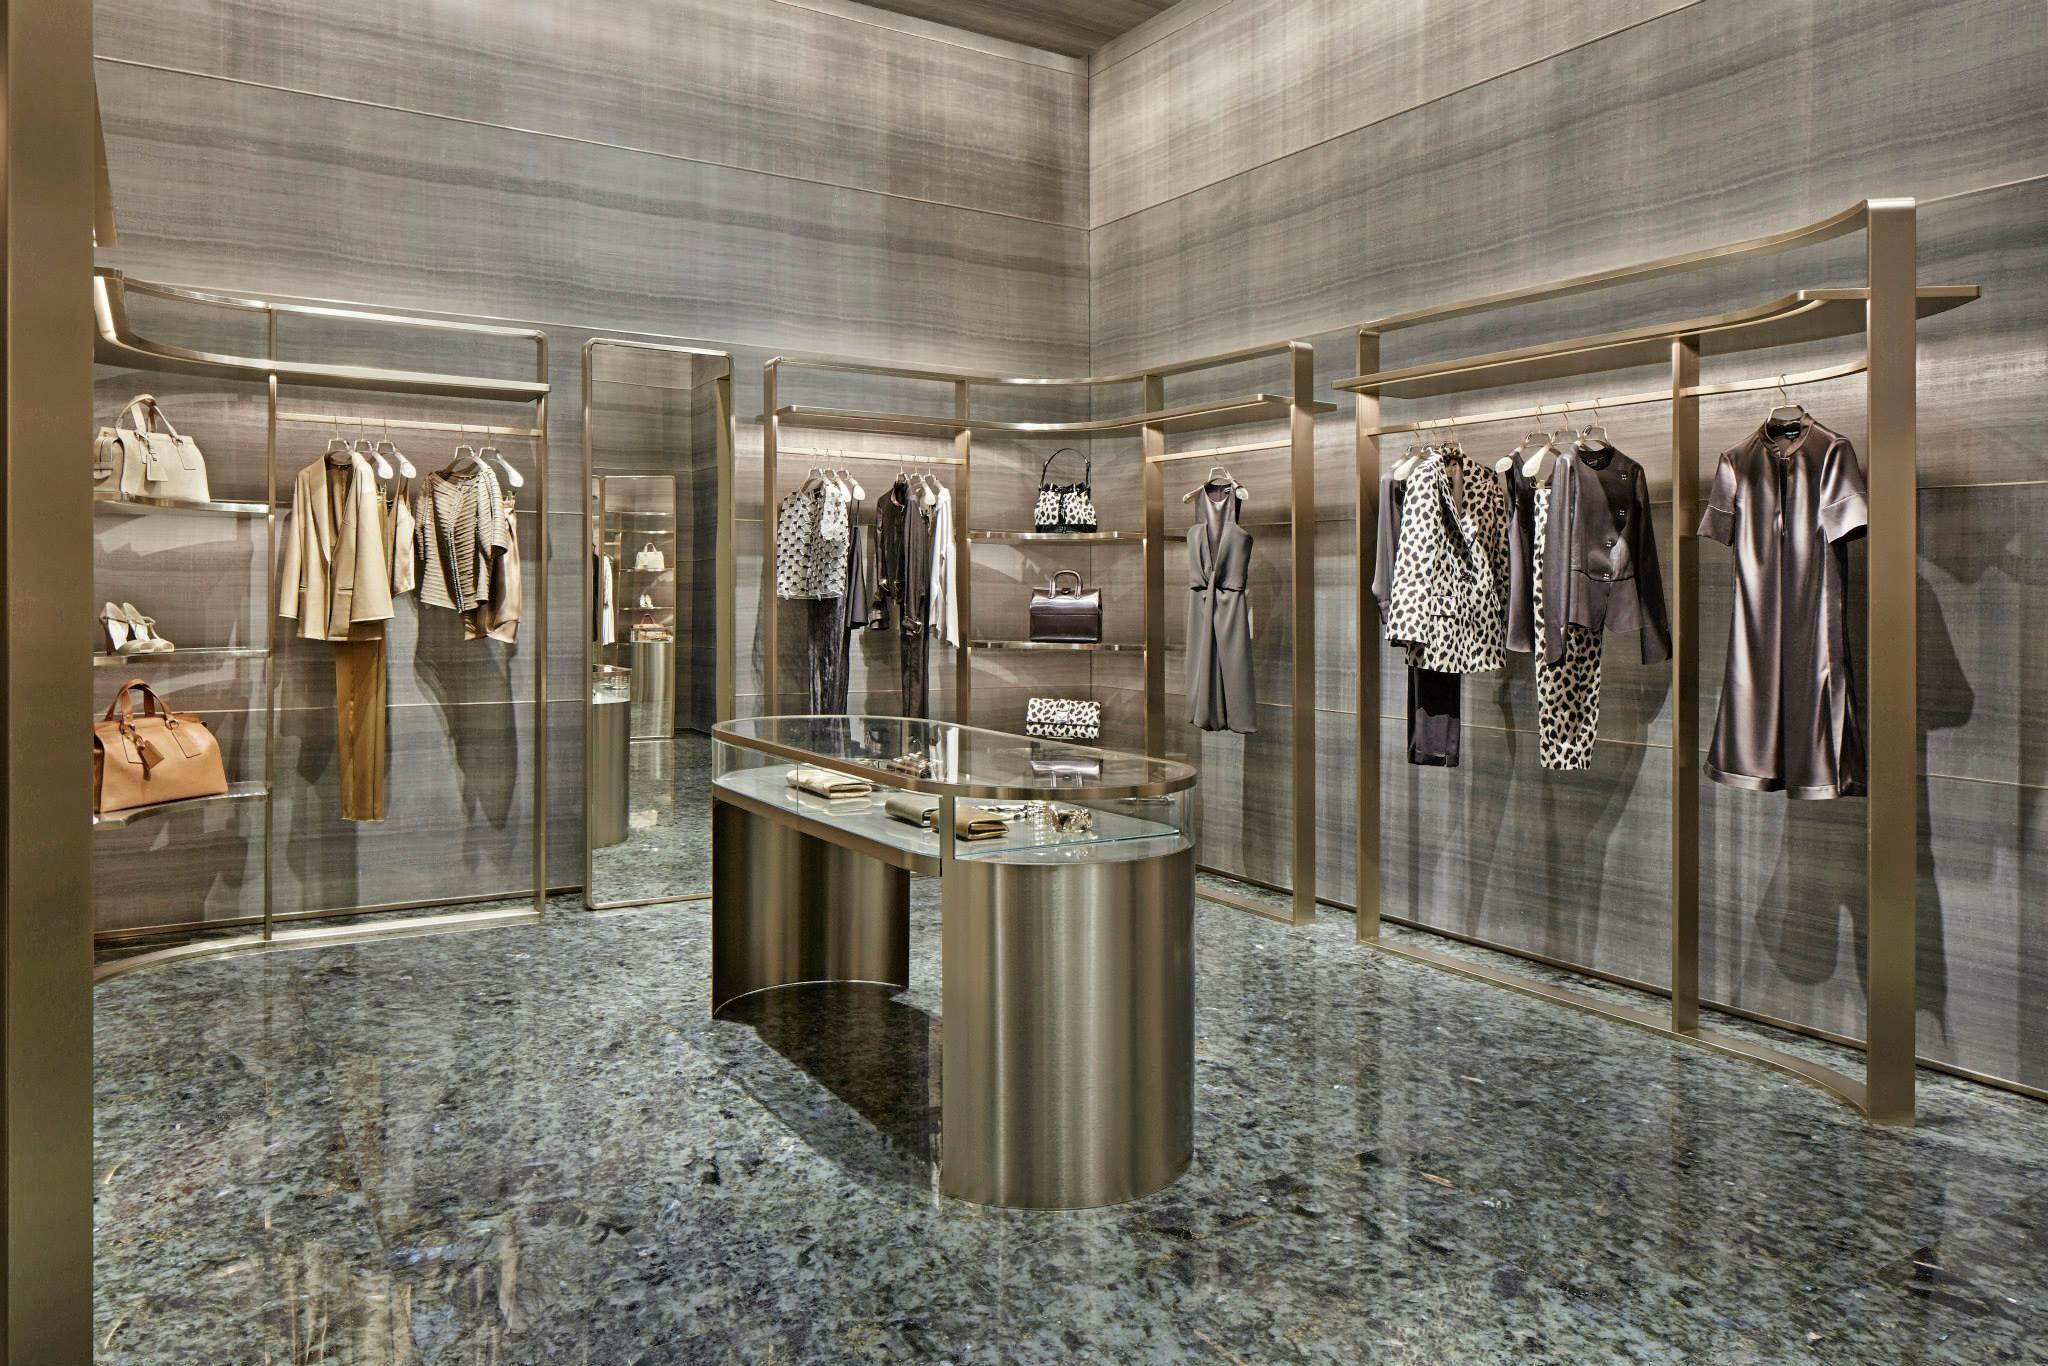 Pin by Devin Demond on ARMANI BOUTIQUES | Armani store ...